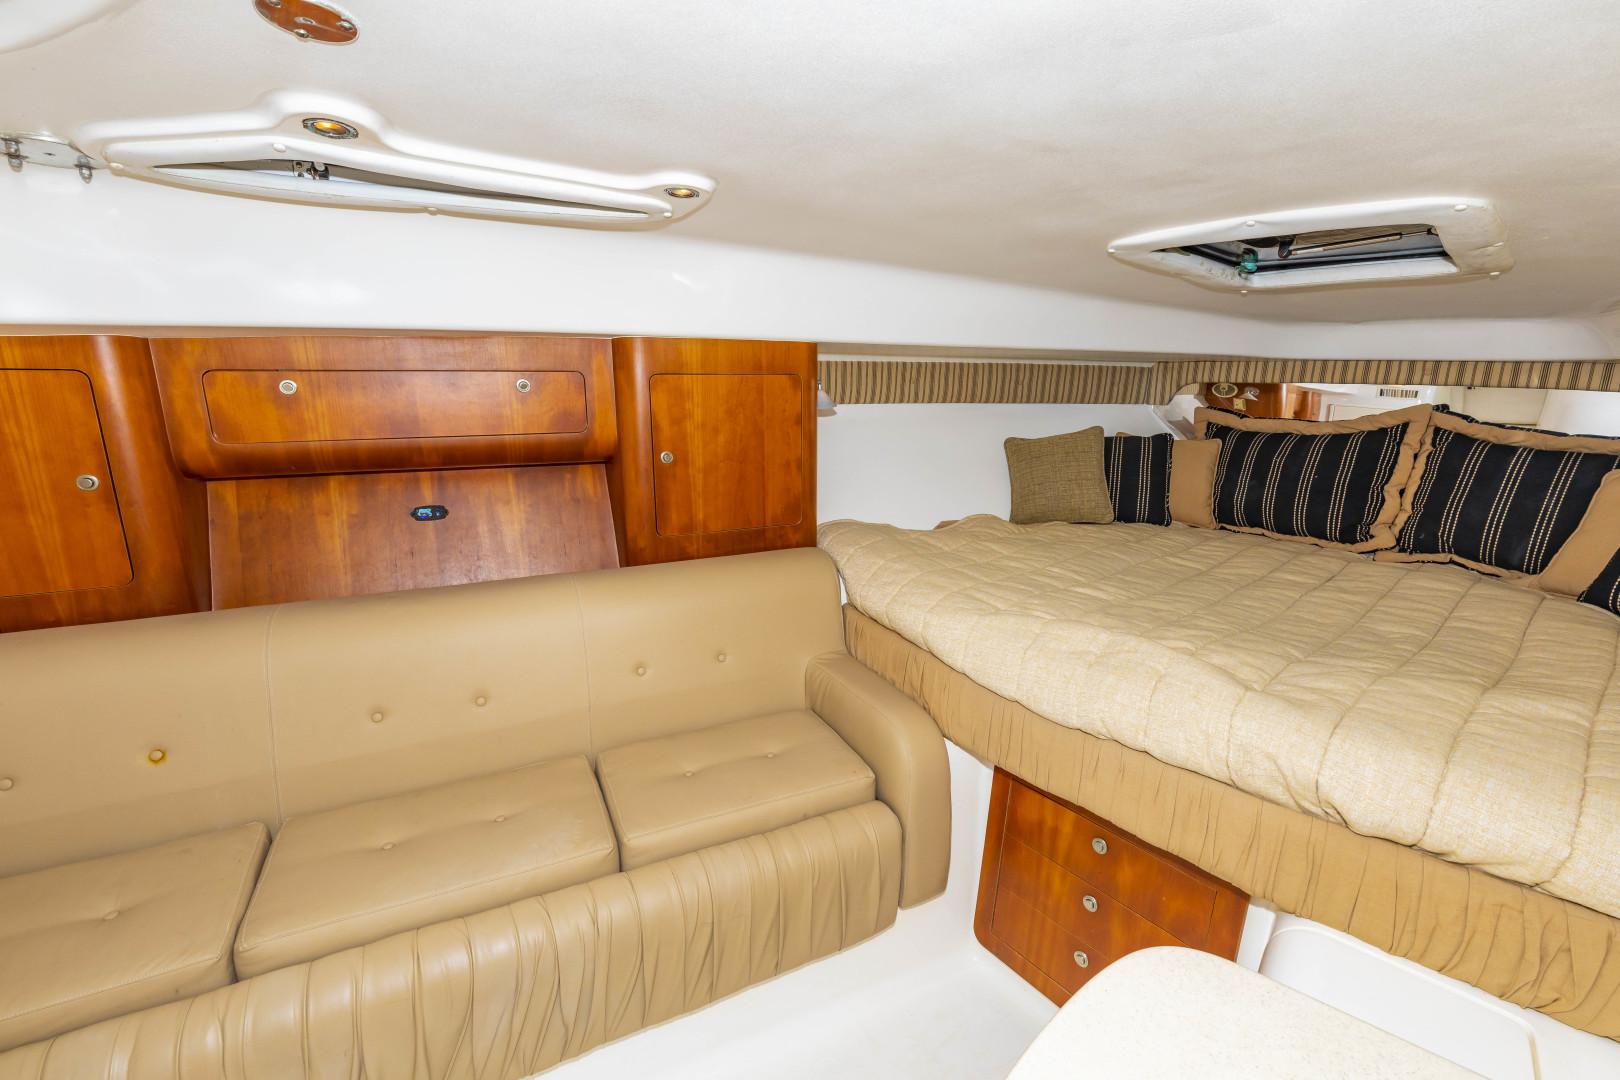 Intrepid-377 Walkaround 2005-Rock Boat REFIT 2018 Dania Beach-Florida-United States-377 Intrepid Interior 3-1511552 | Thumbnail